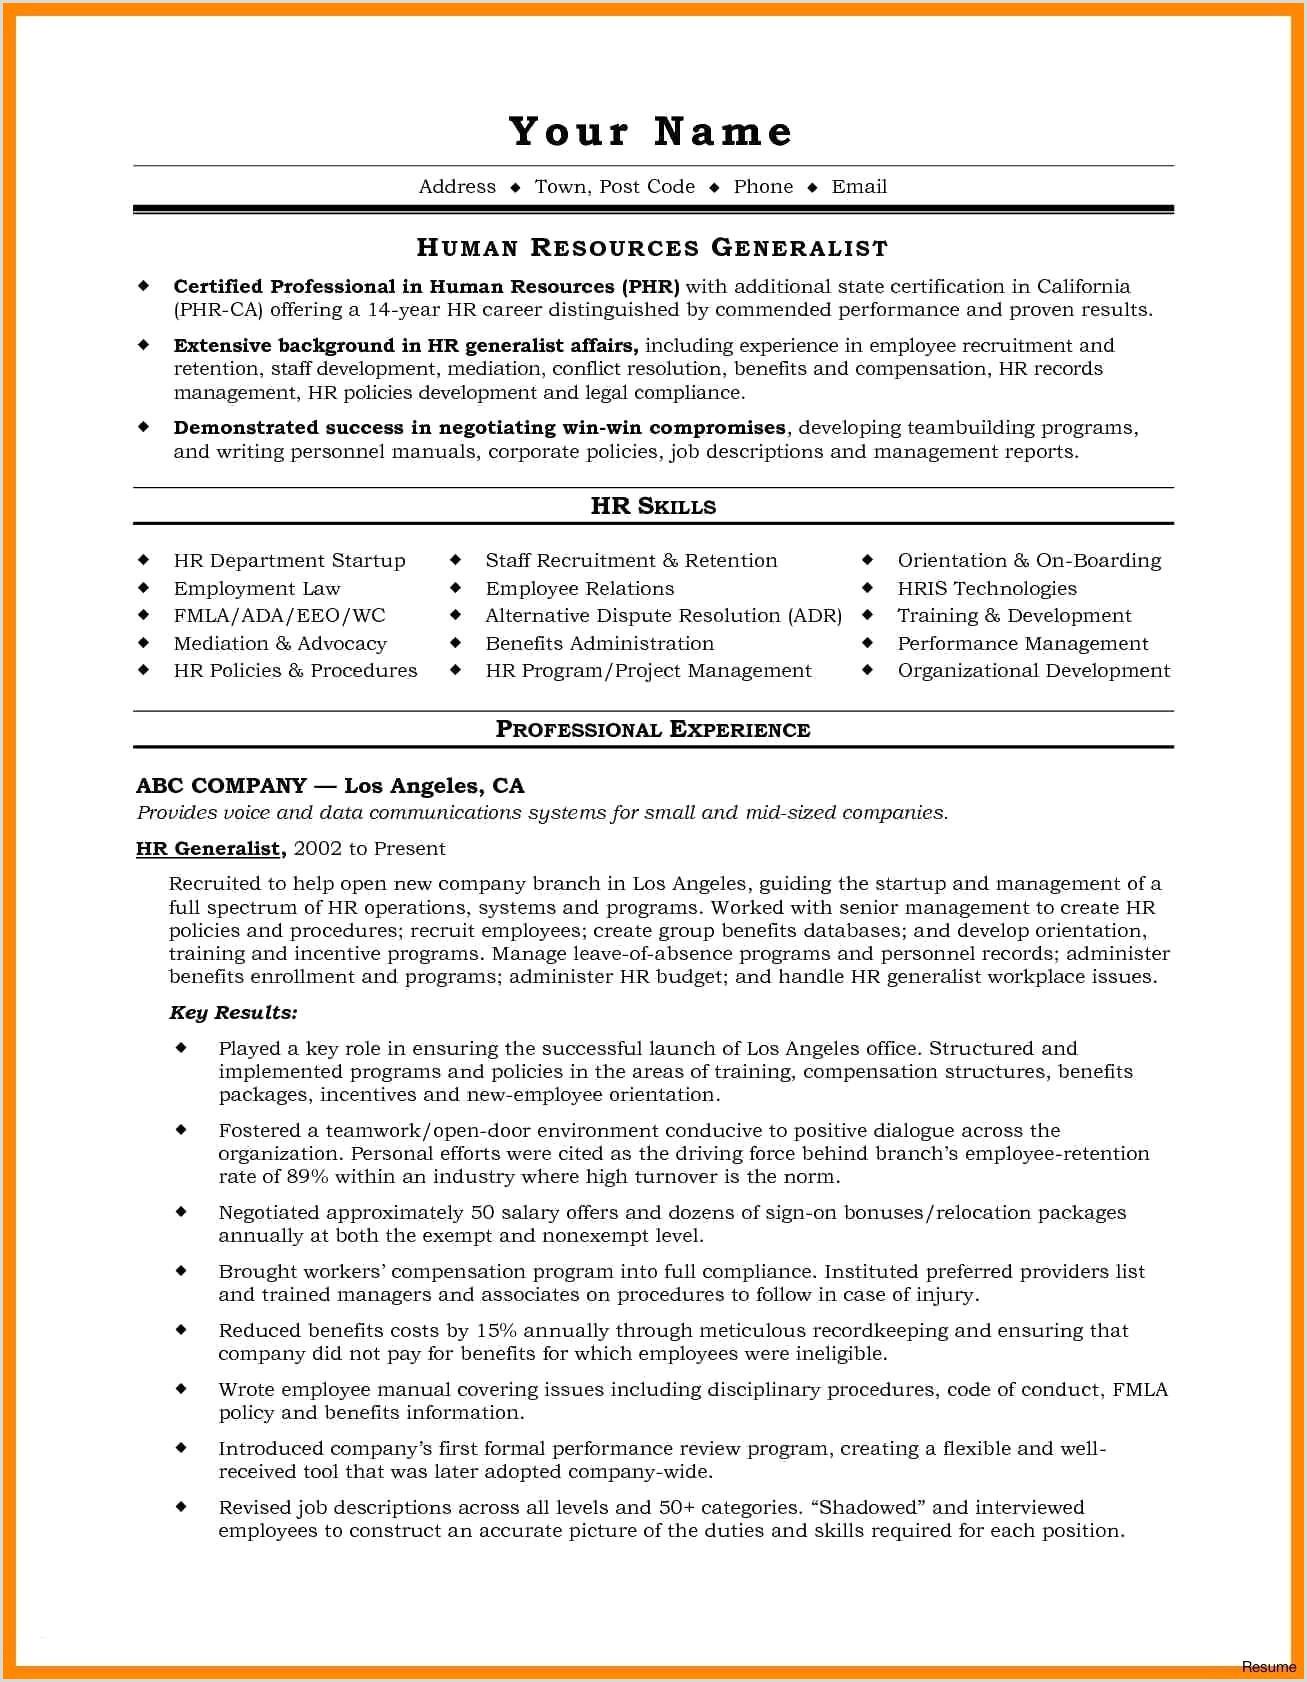 Exemple Cv Post Bac Libre 49 Génial Curriculum Vitae Apb